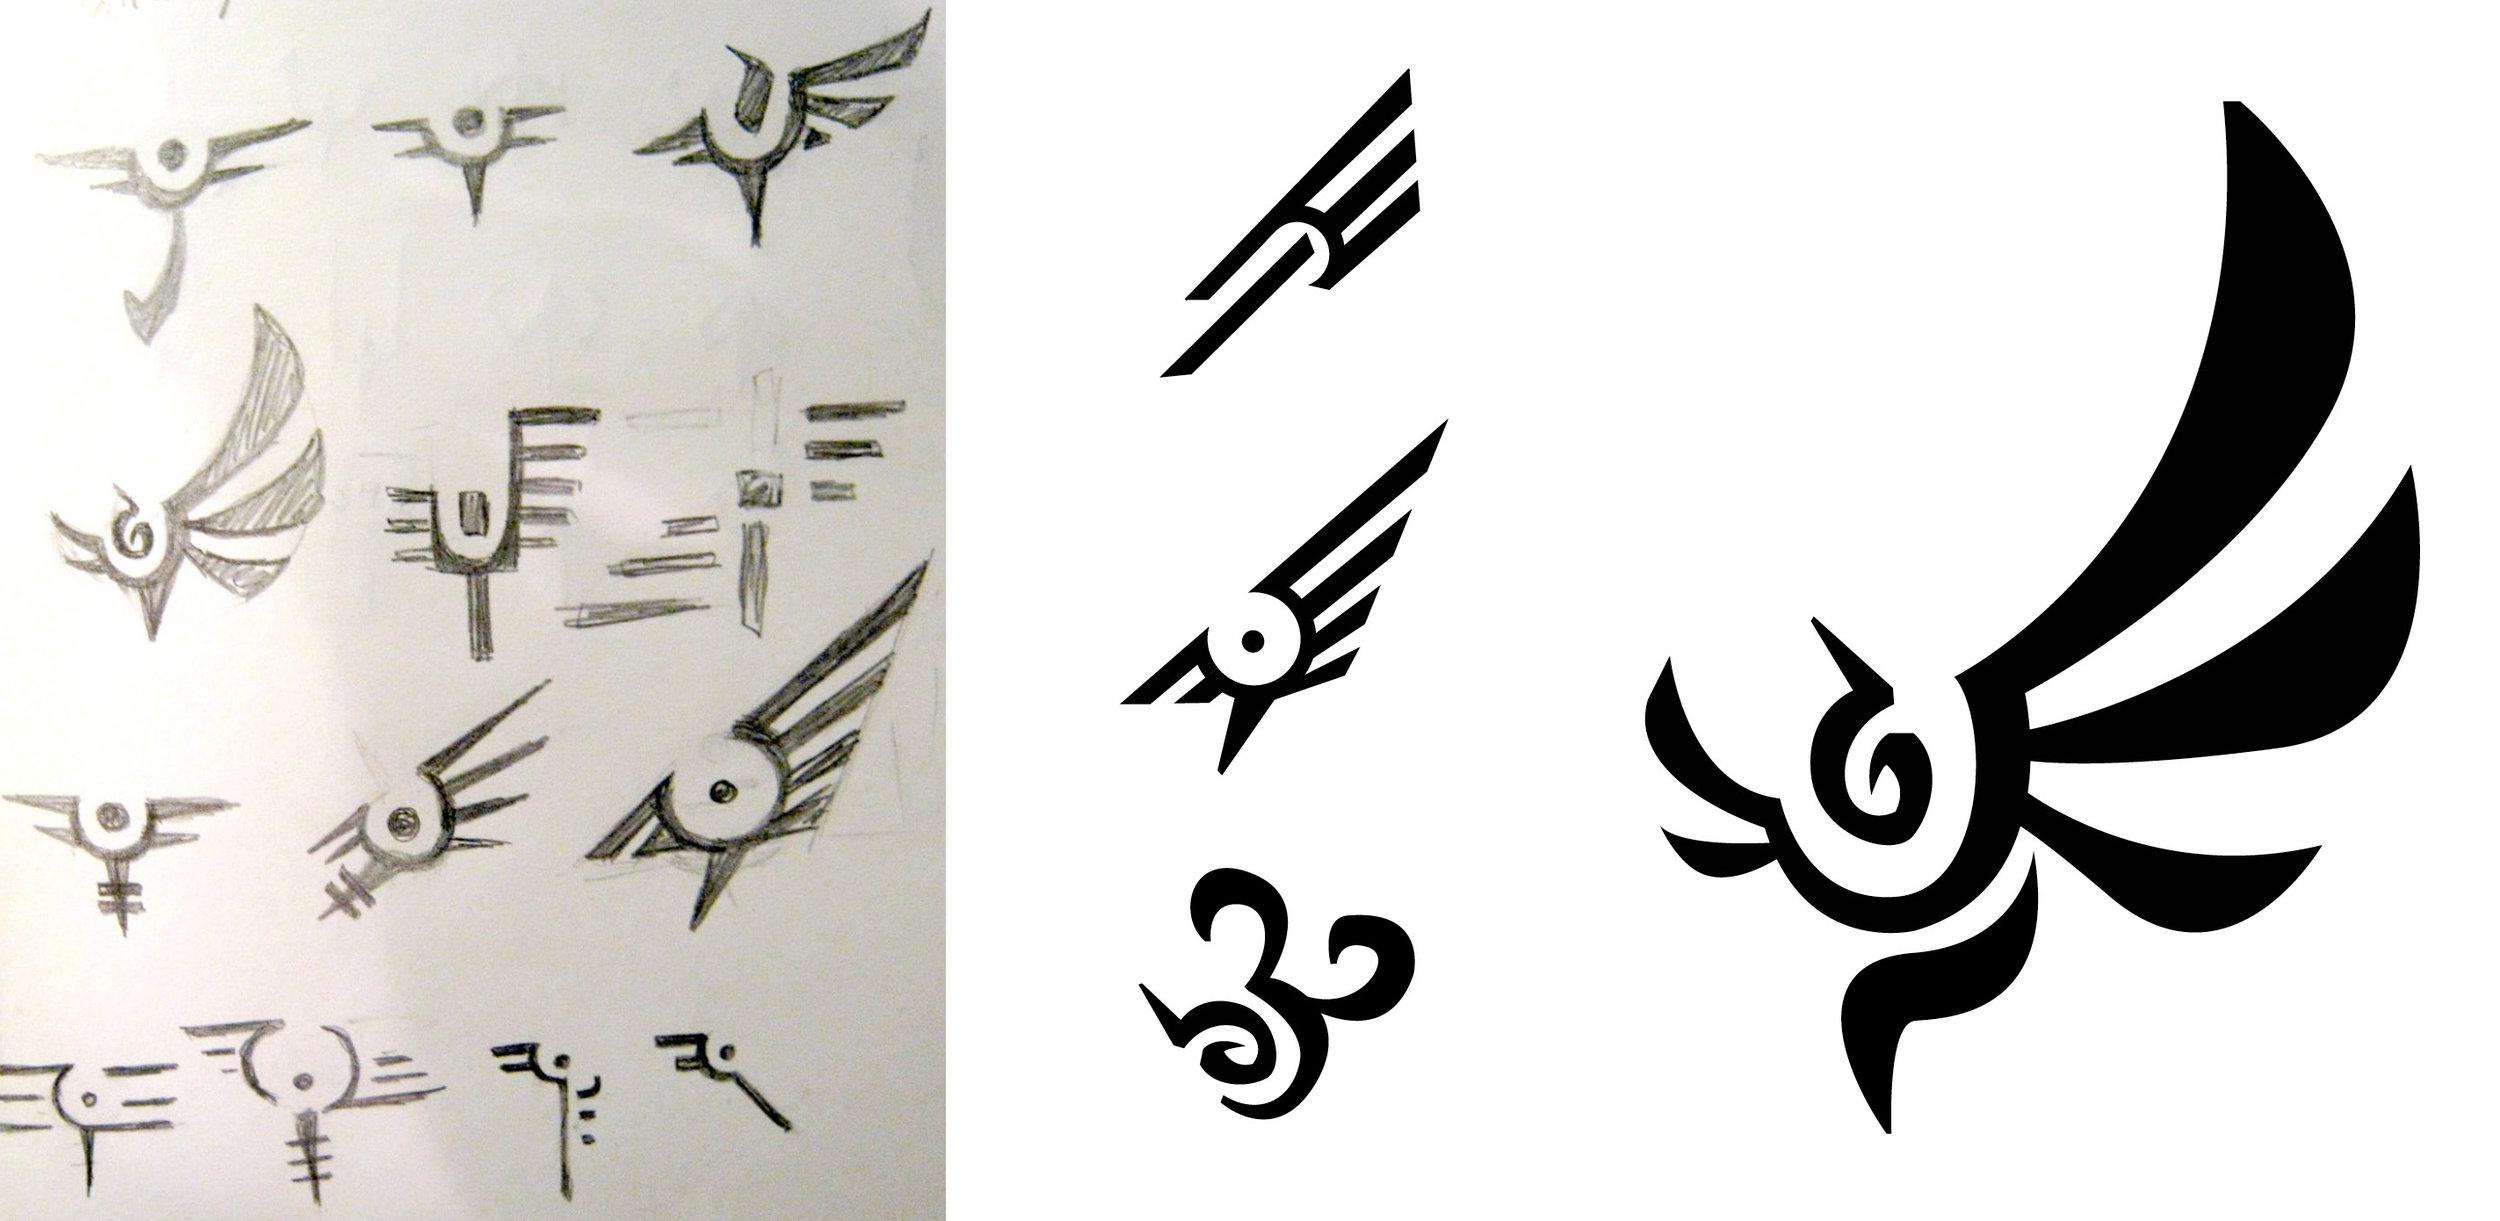 design by sam childs